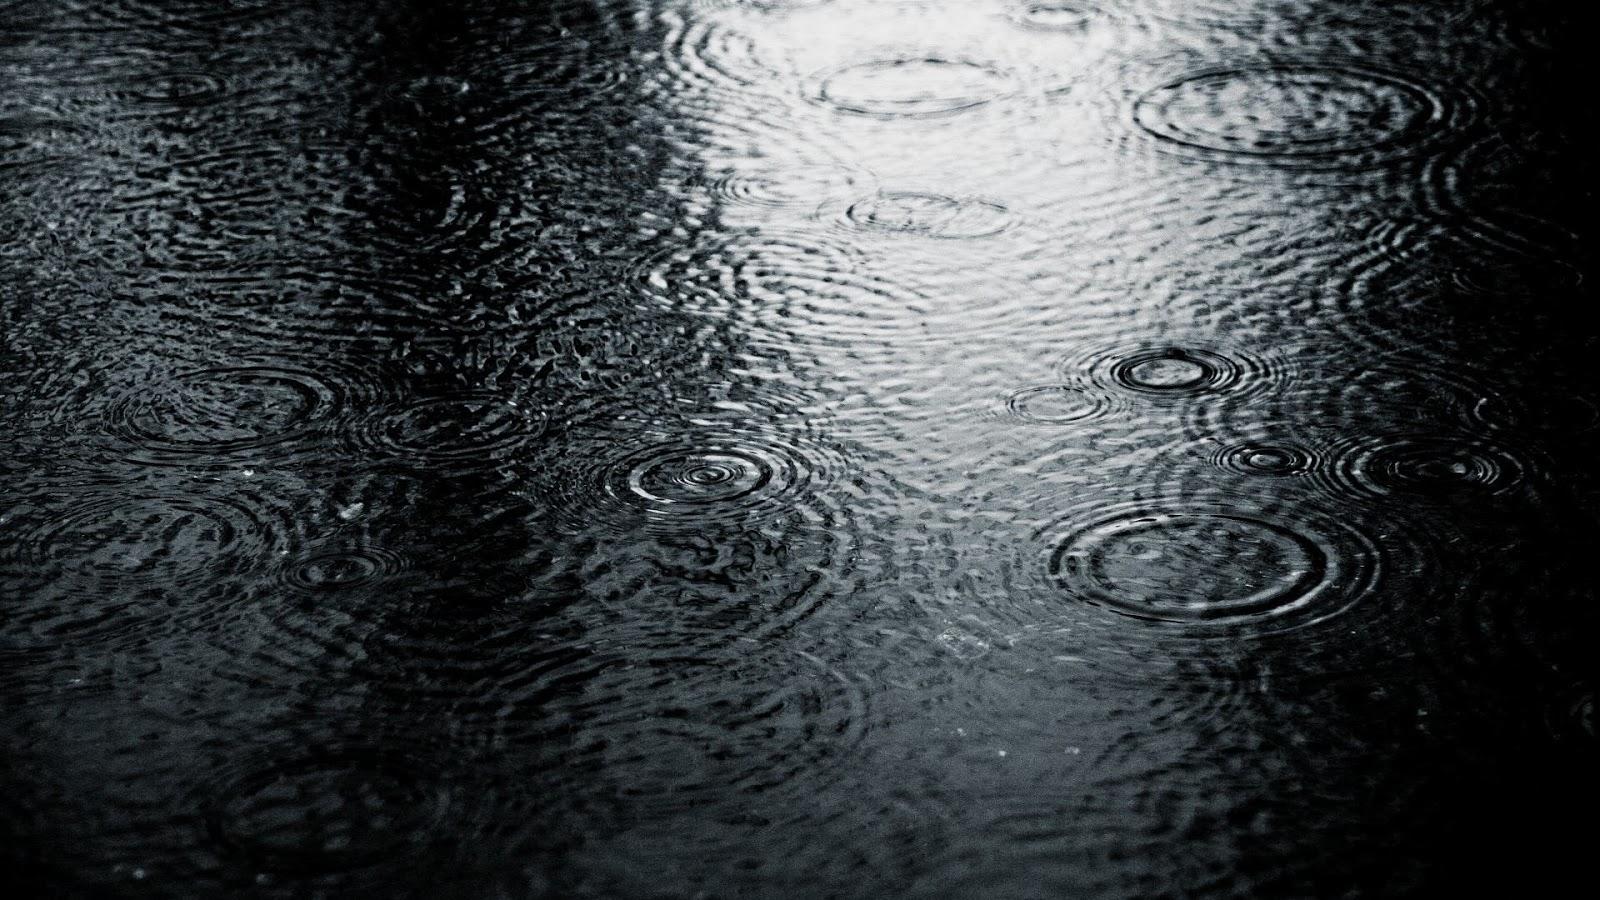 rainy day wallpaper 3 rainy day wallpaper 4 rainy day wallpaper 5 1600x900